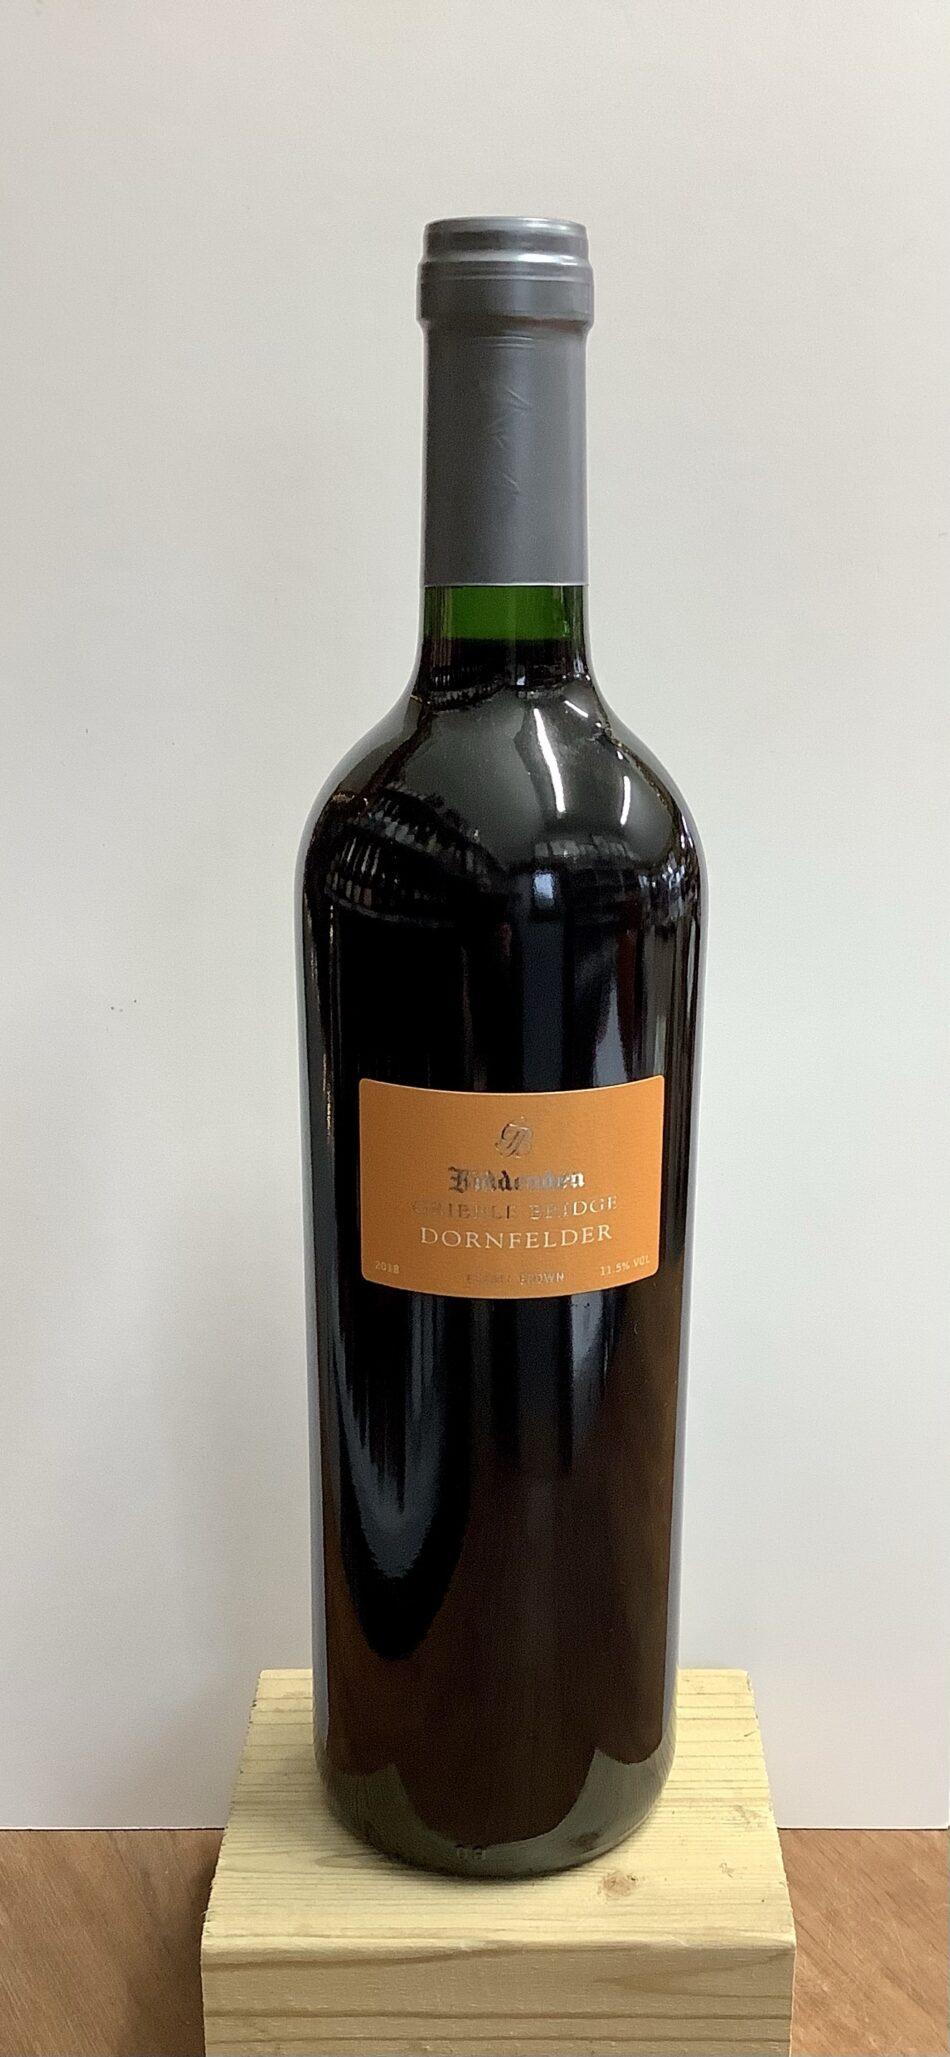 Biddenden Dornfelder Red Wine 1